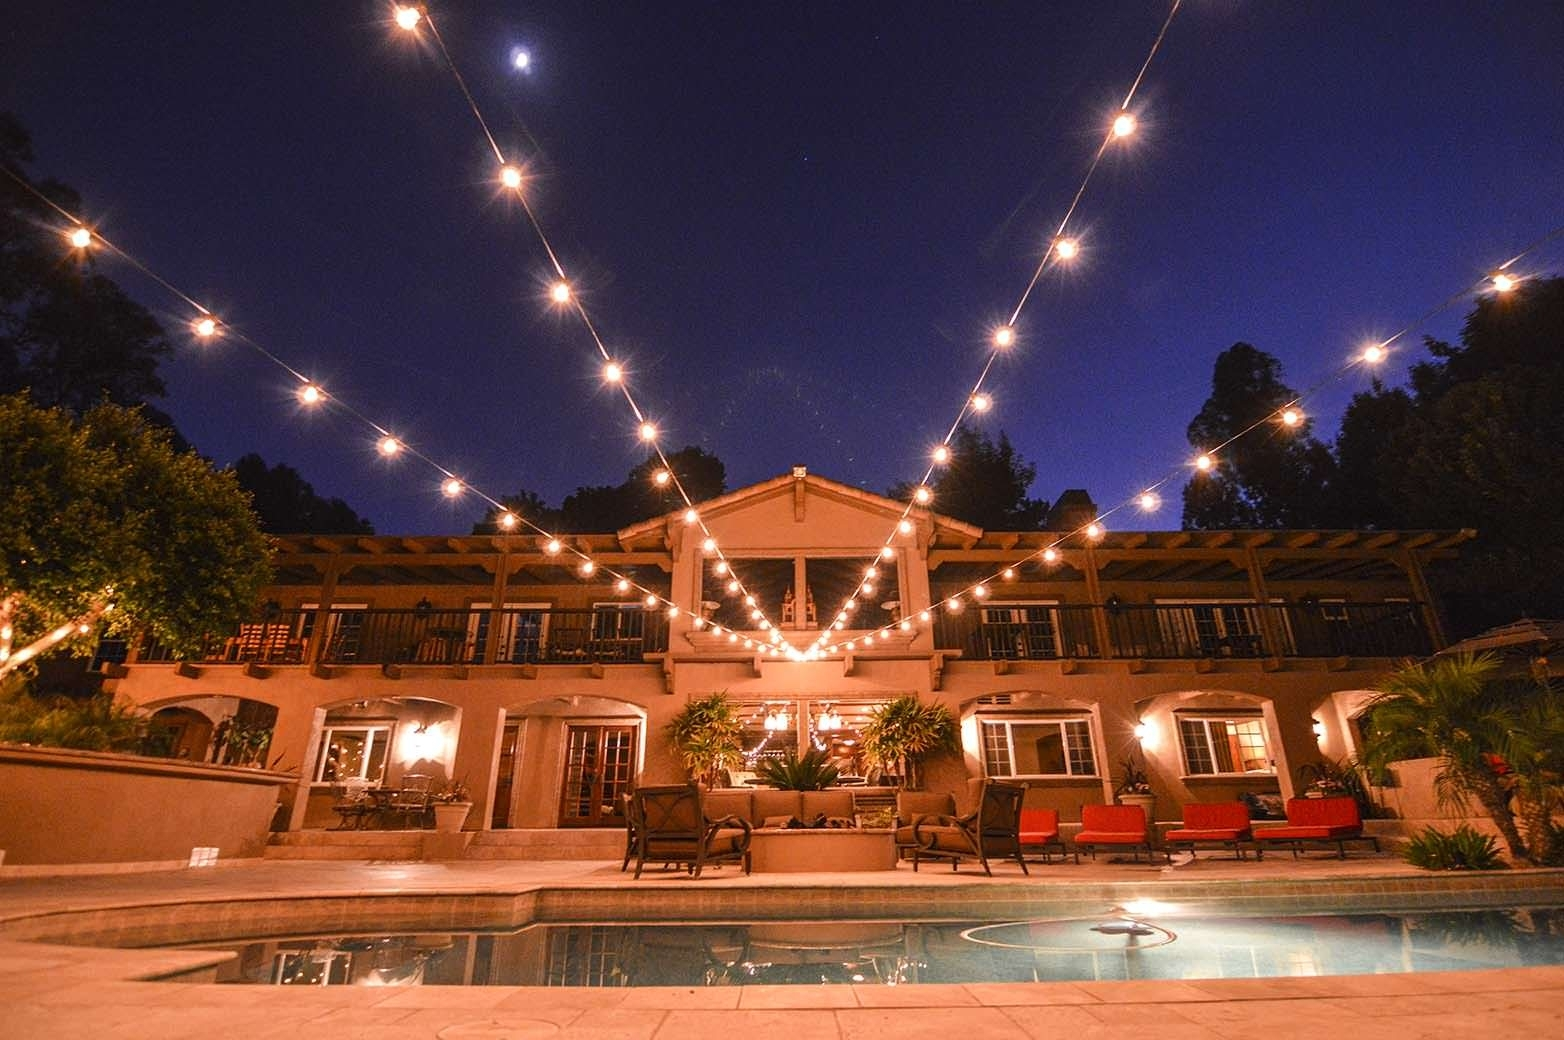 Lighting - Hanging Lights - Av Party Rental with regard to Outdoor Lanterns on String (Image 8 of 20)